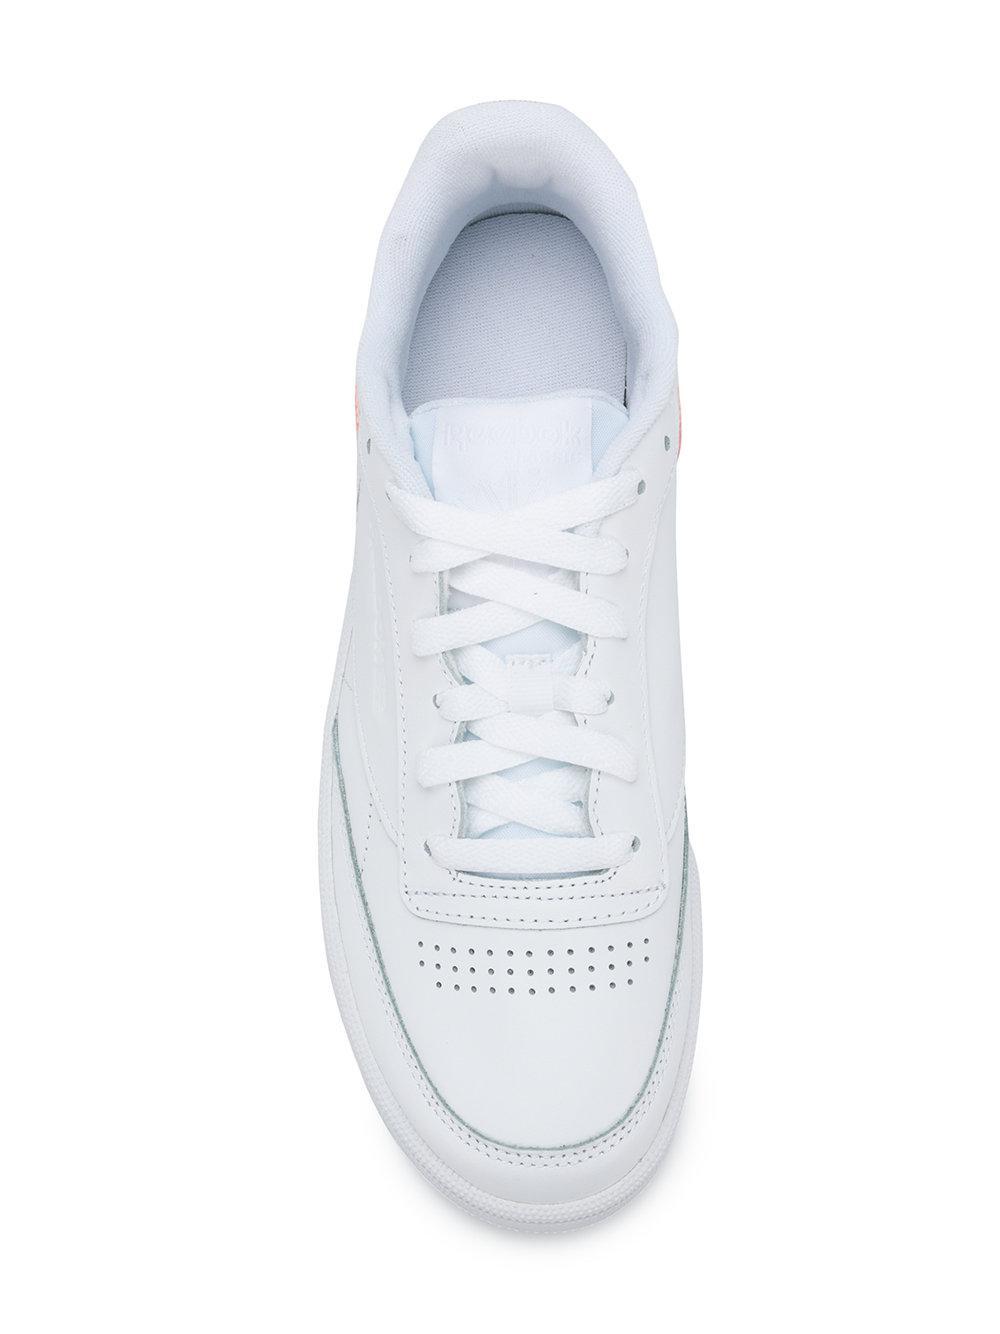 Reebok Leather Contrast Heel Sneakers in White